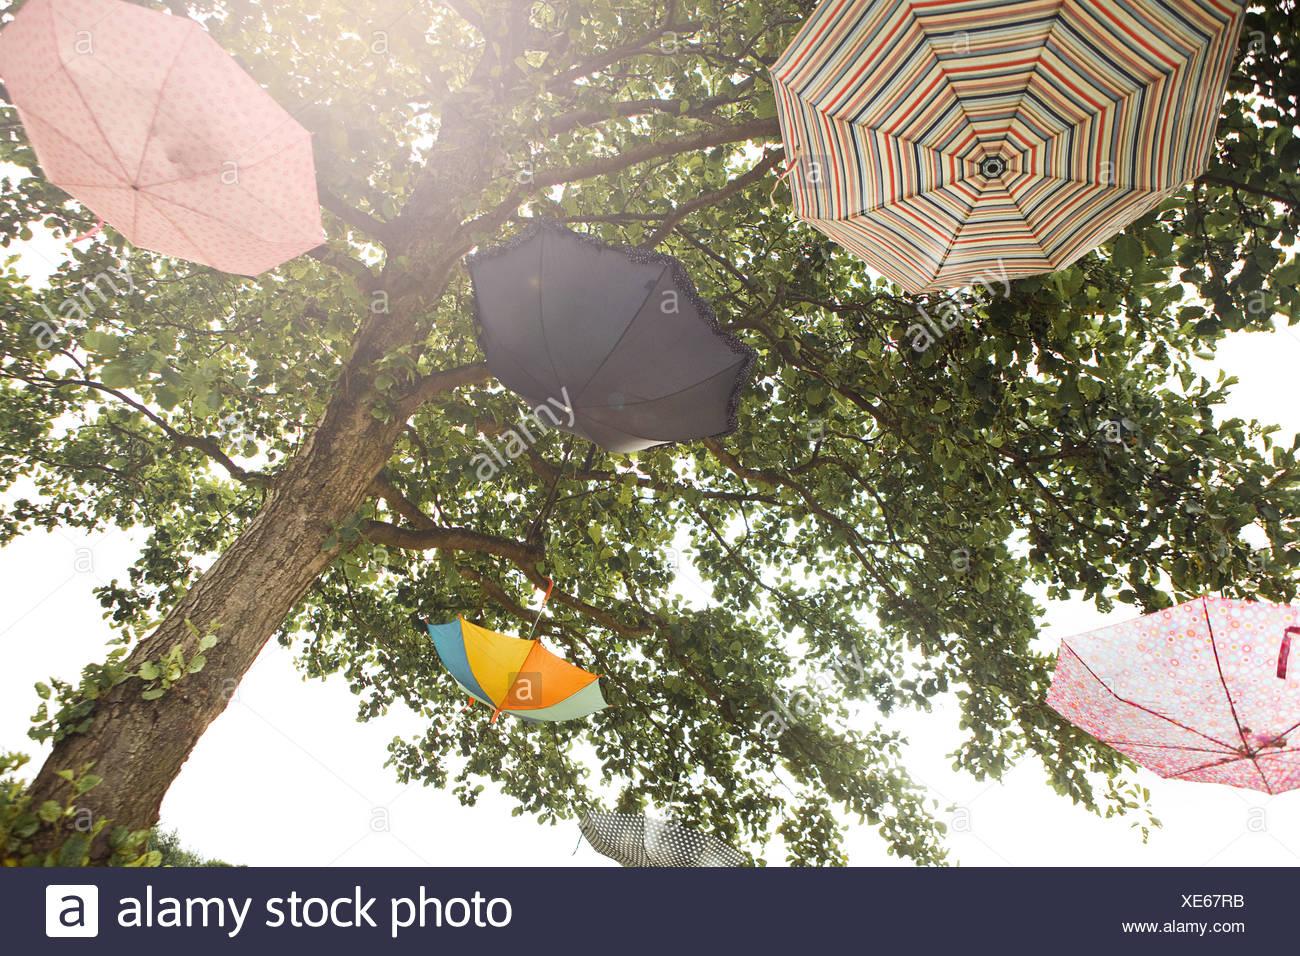 Umbrellas hanging in trees - Stock Image